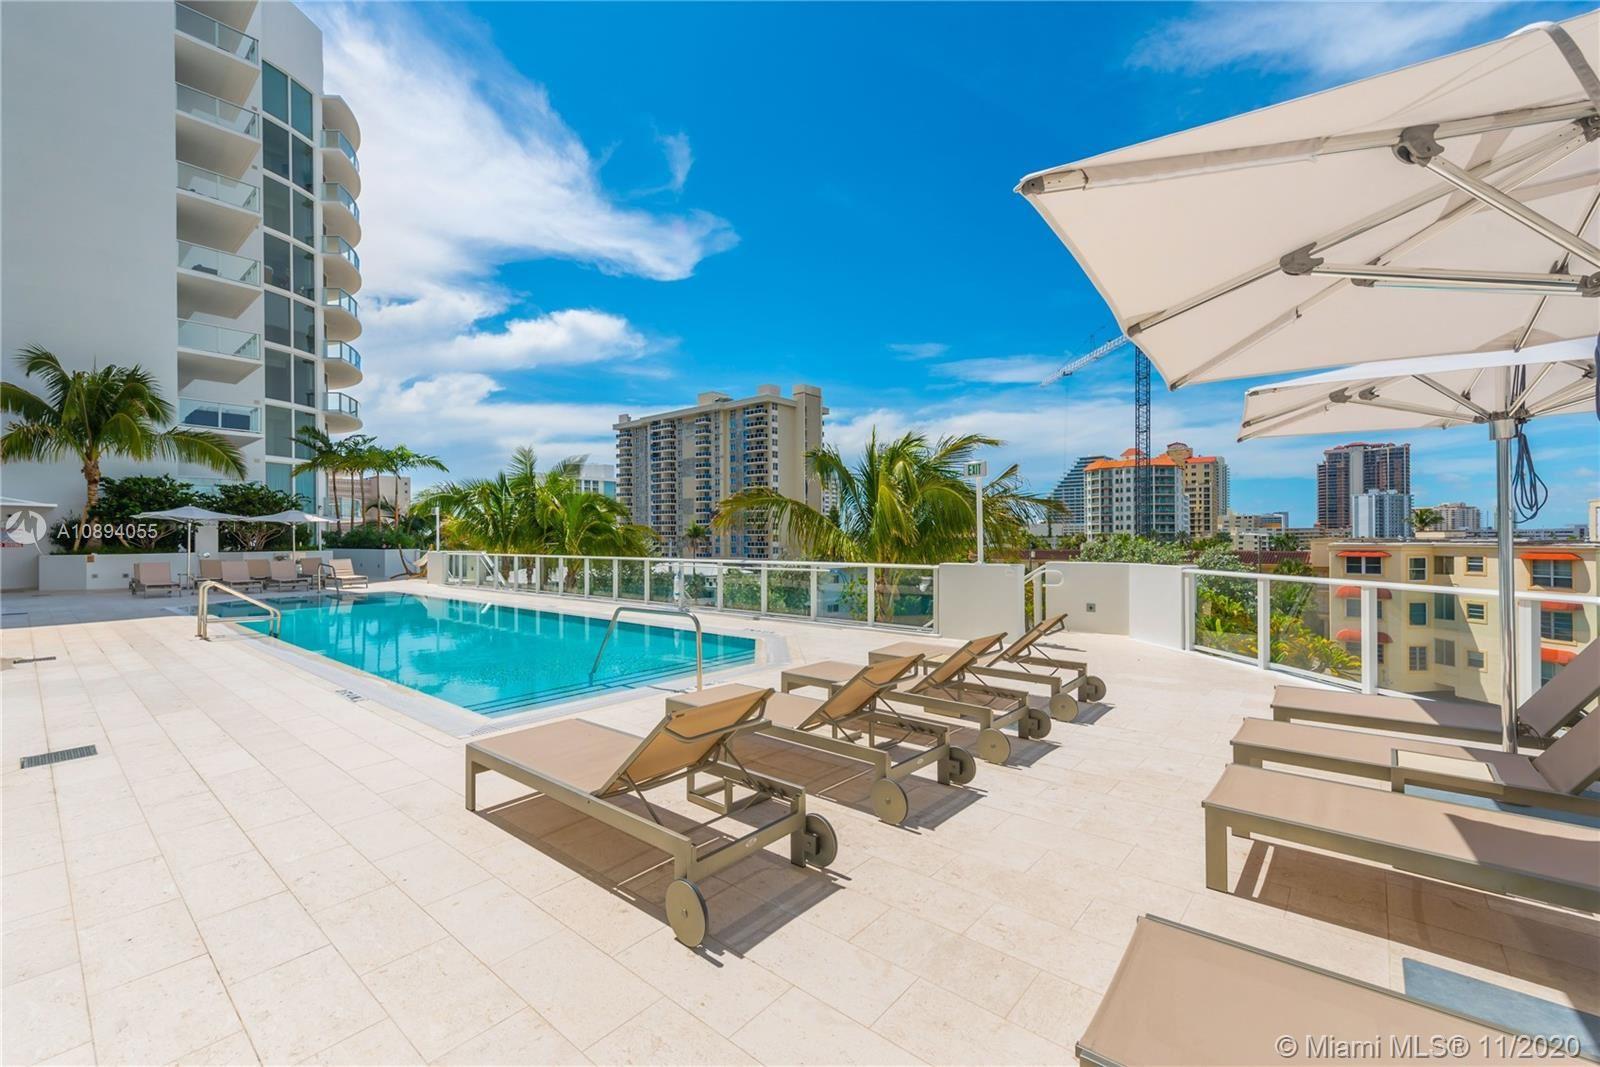 401 N Birch Rd #903, Fort Lauderdale, FL 33304 - #: A10894055